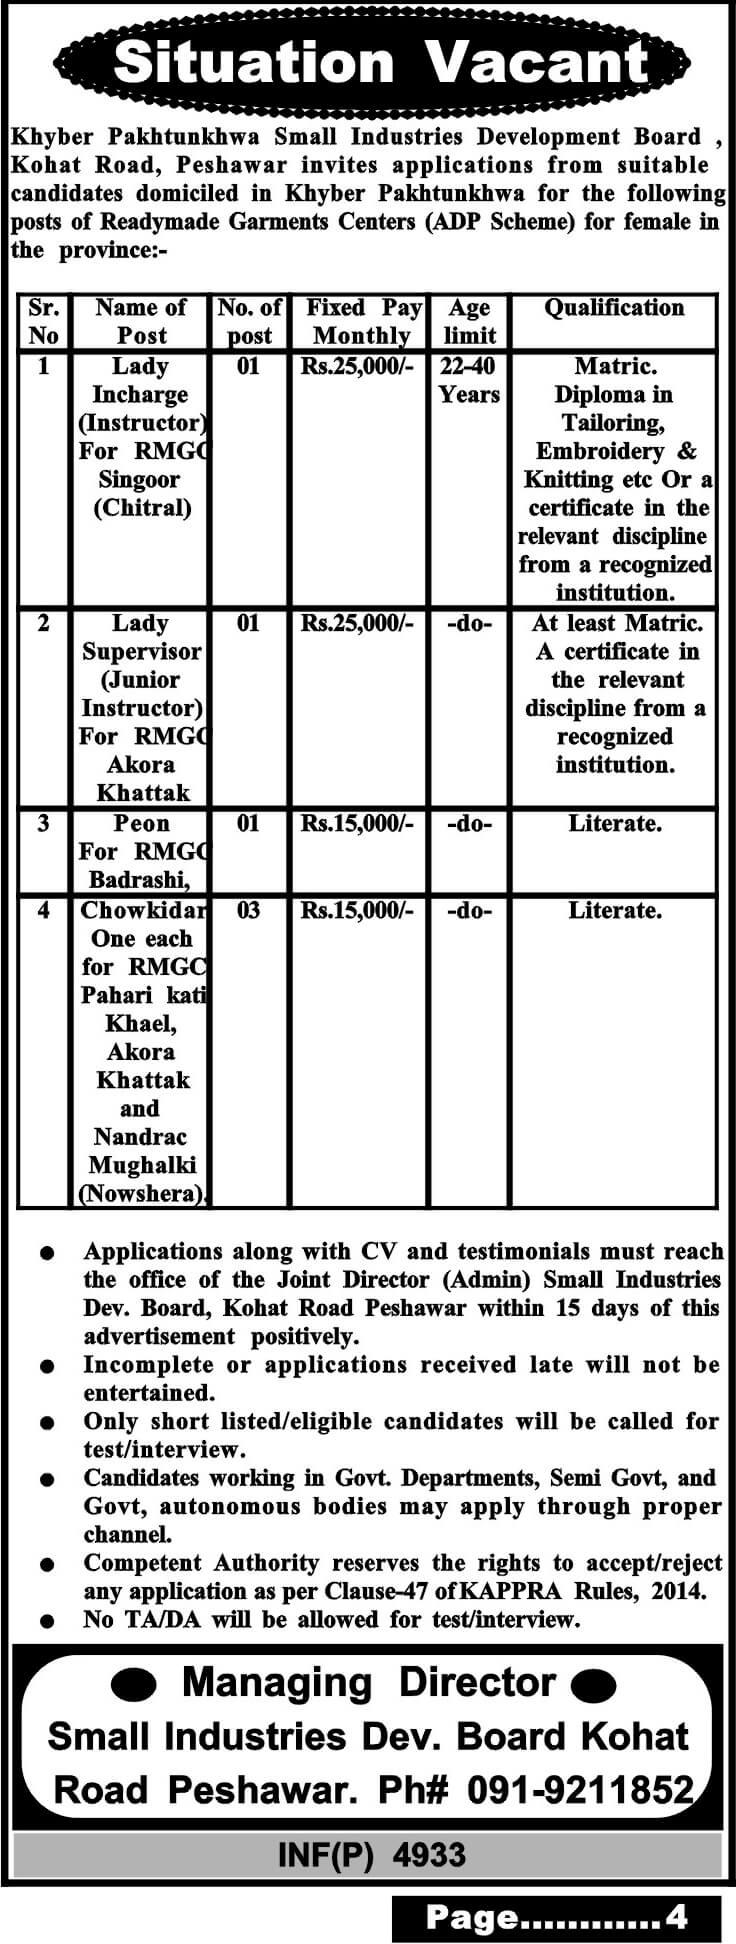 KPK Small Industries Development Board Jobs 2019 Government Jobs  in KPK on December, 2018 | Government